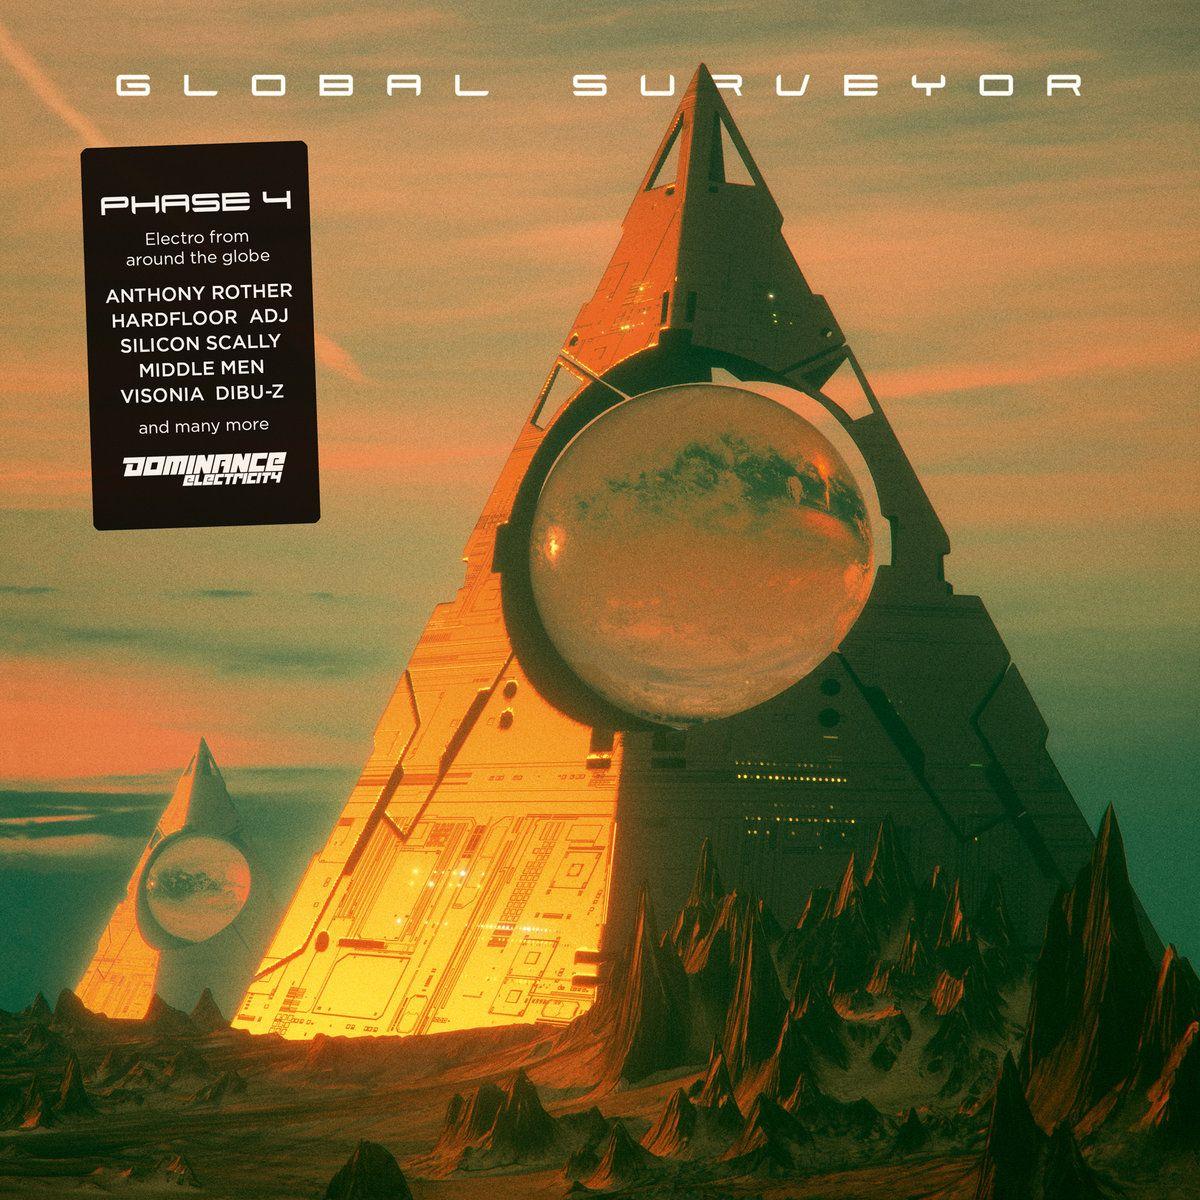 Various Global Surveyor Phase 4 Cool Album Covers Phase 4 Electronic Music